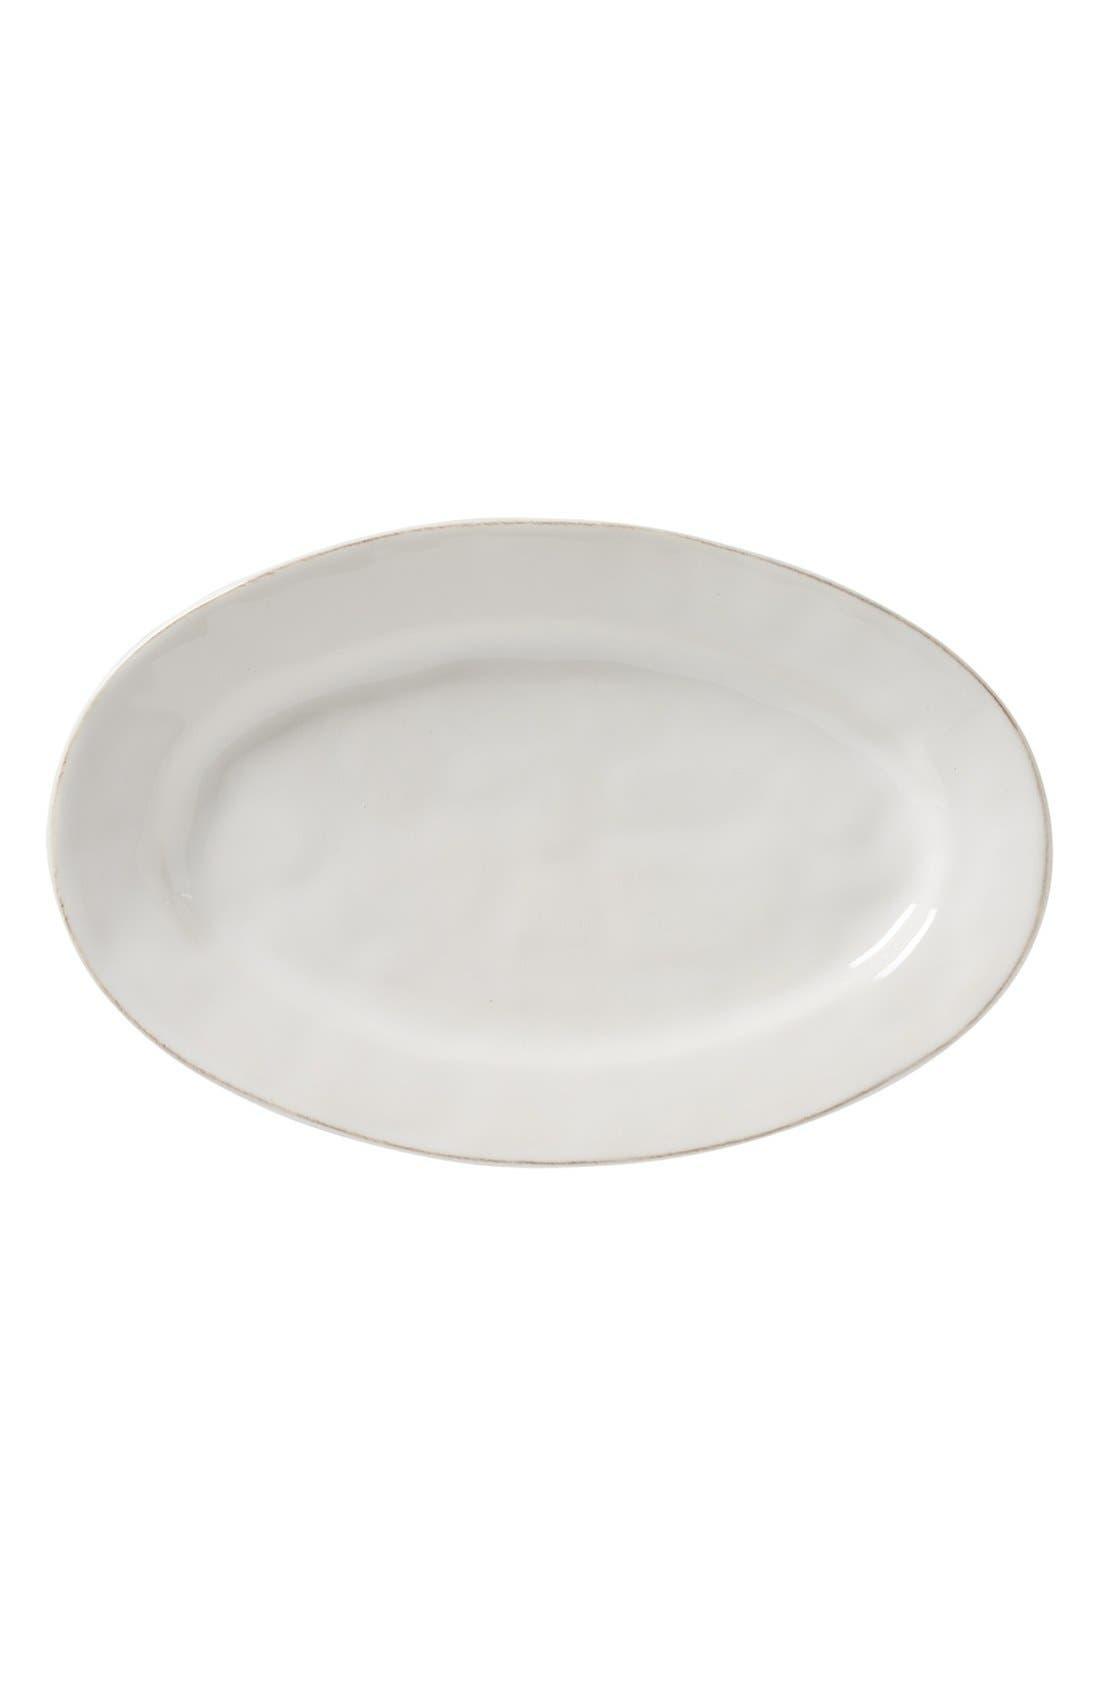 'Puro' Oval Platter,                             Main thumbnail 1, color,                             100